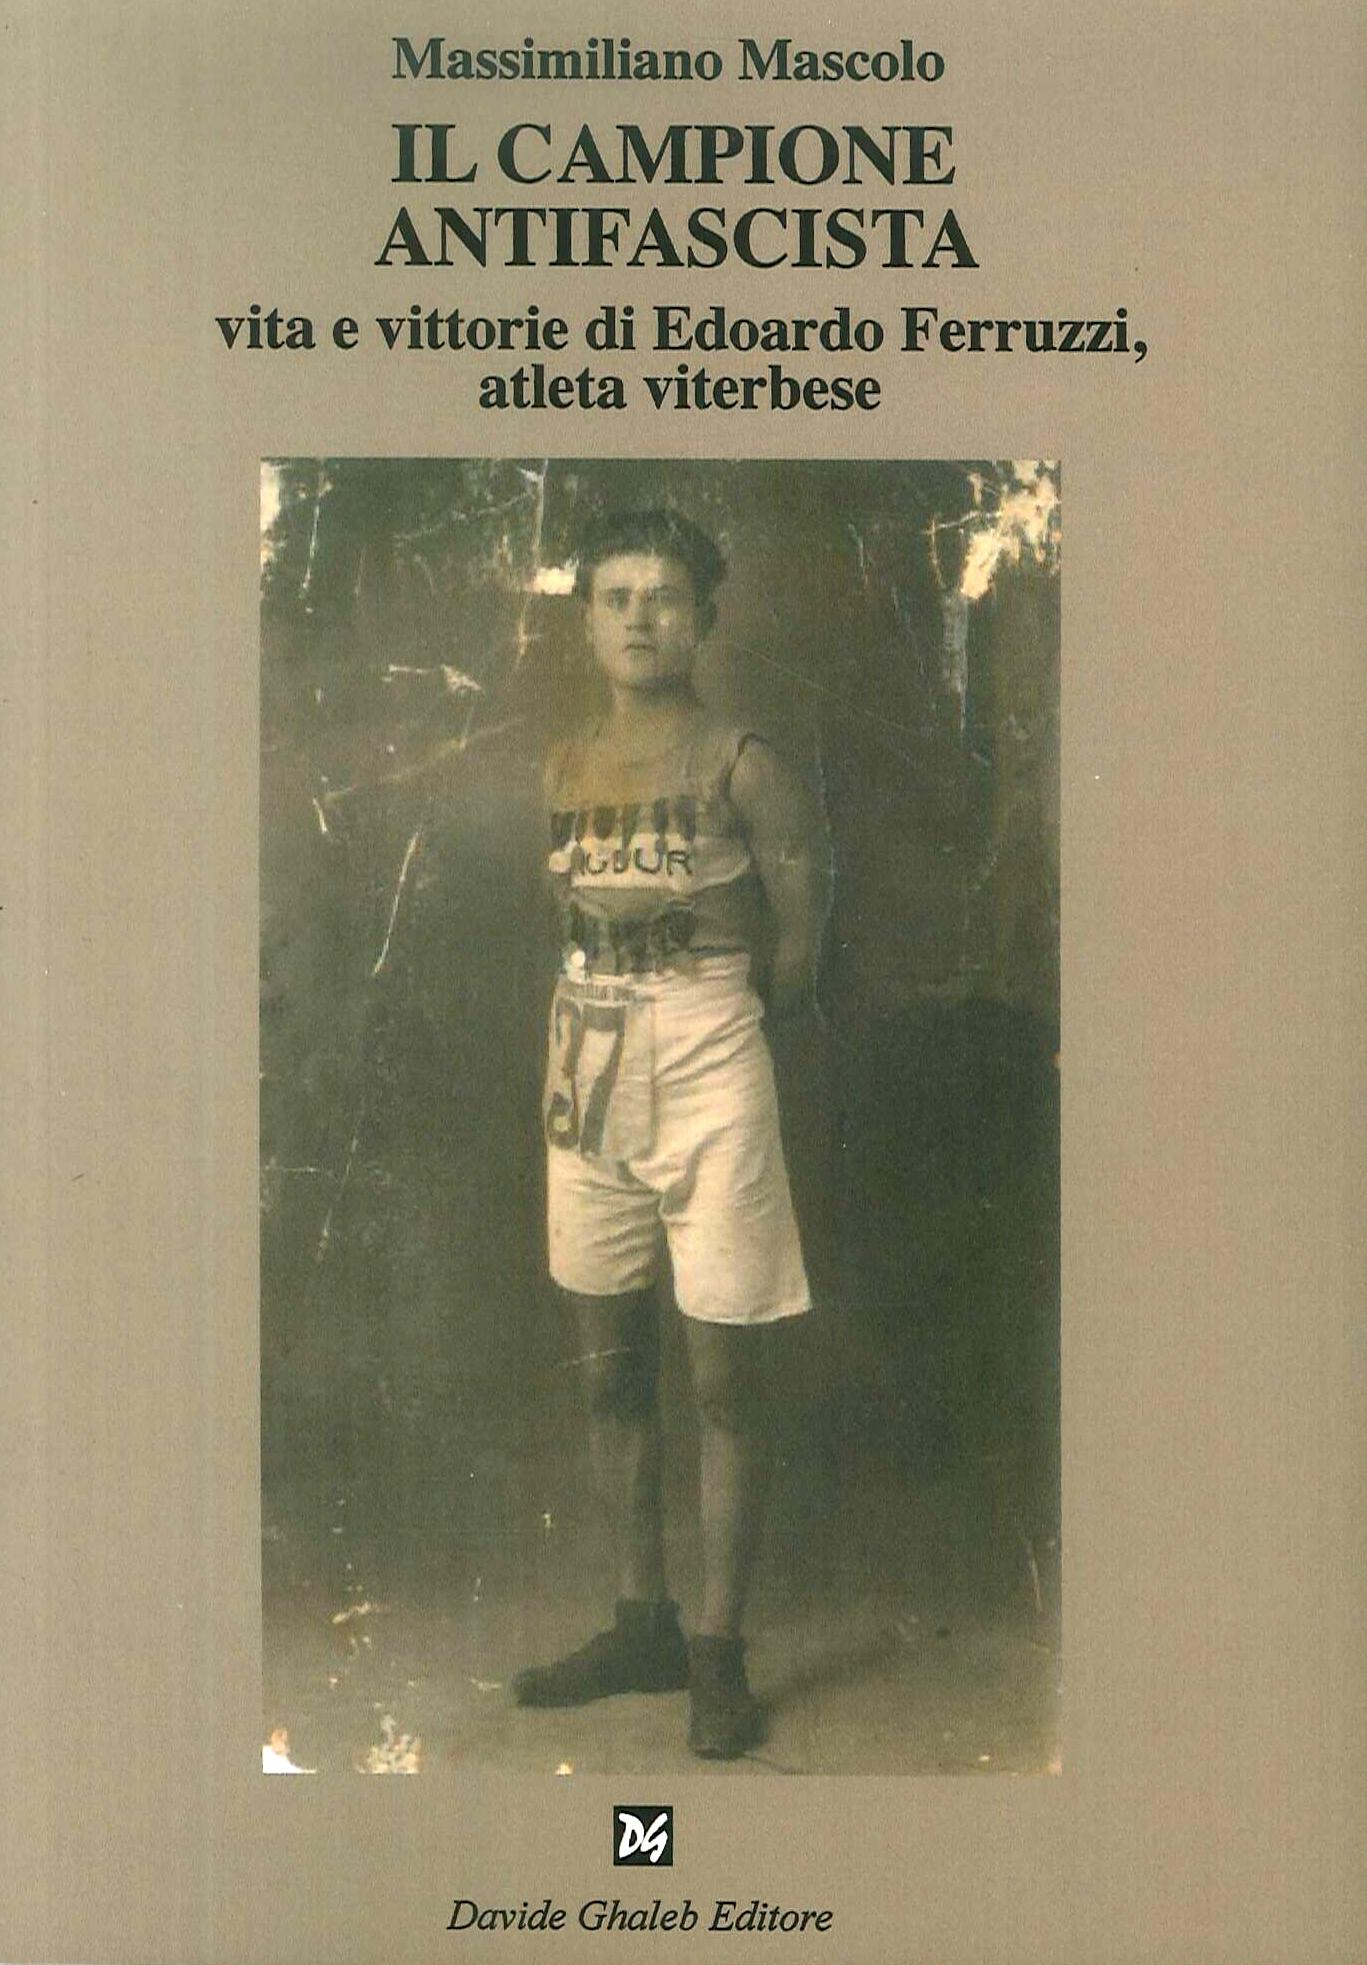 Il campione antifascista vita e vittorie di Edoardo Ferruzzi, atleta viterbese